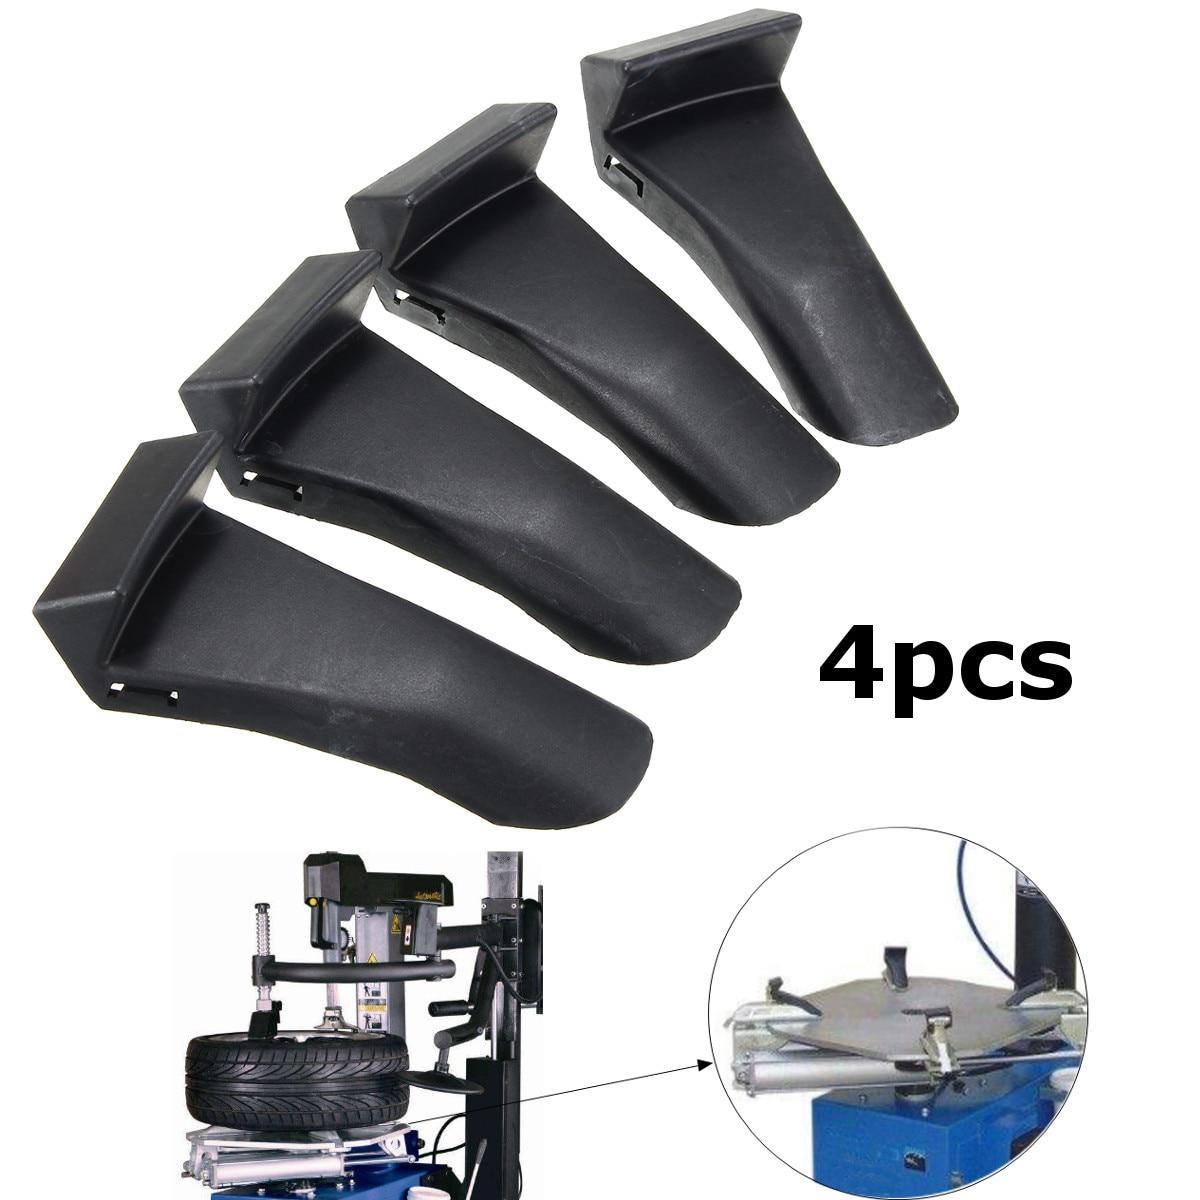 Protector de rueda de plástico negro para cambiador de neumáticos de coche de 4 Uds. 82006393 para 9010E 9010A 9024E 9024A